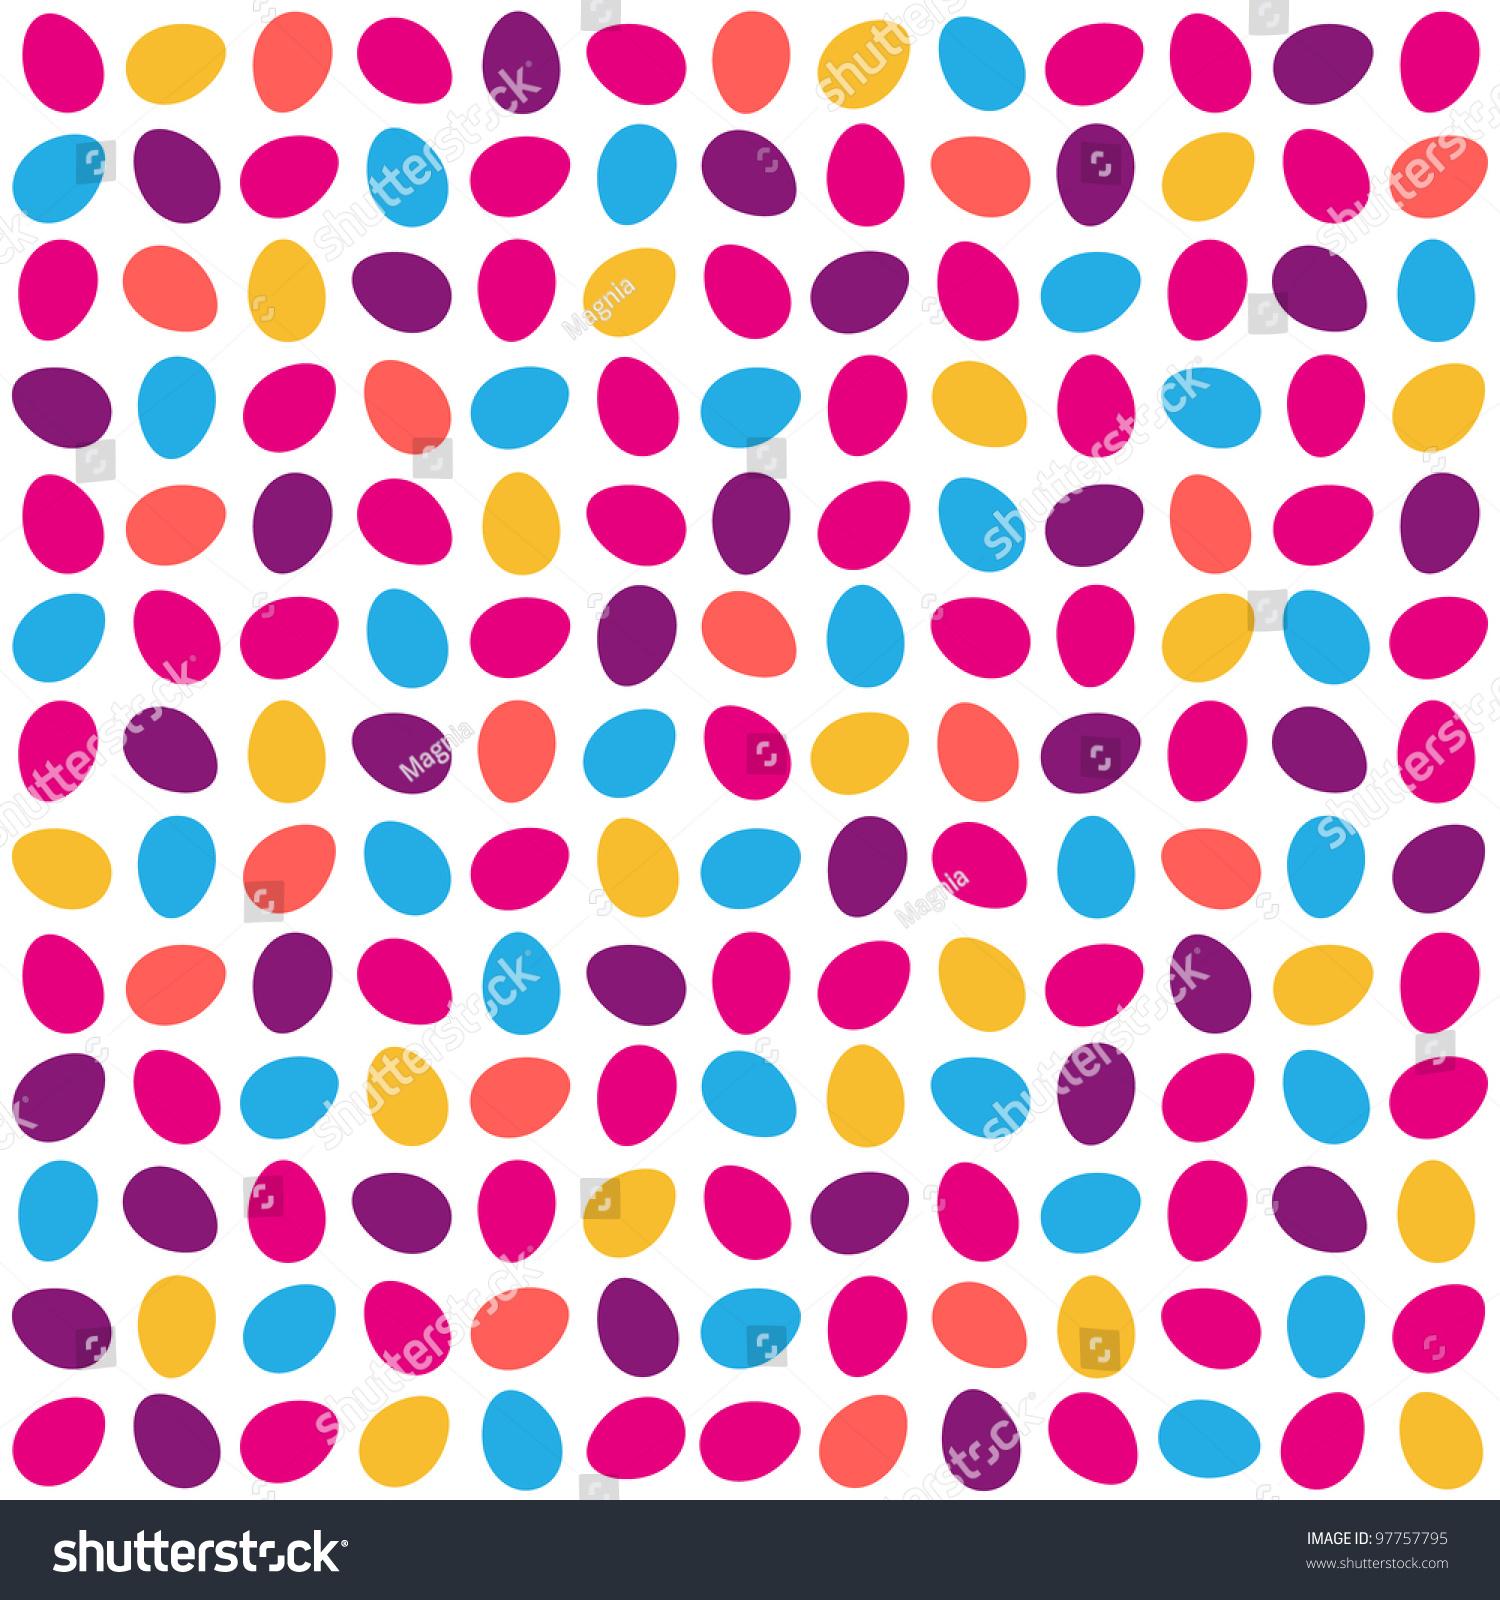 Colorful Egg Pattern On White Background Stock Vector Illustration ...